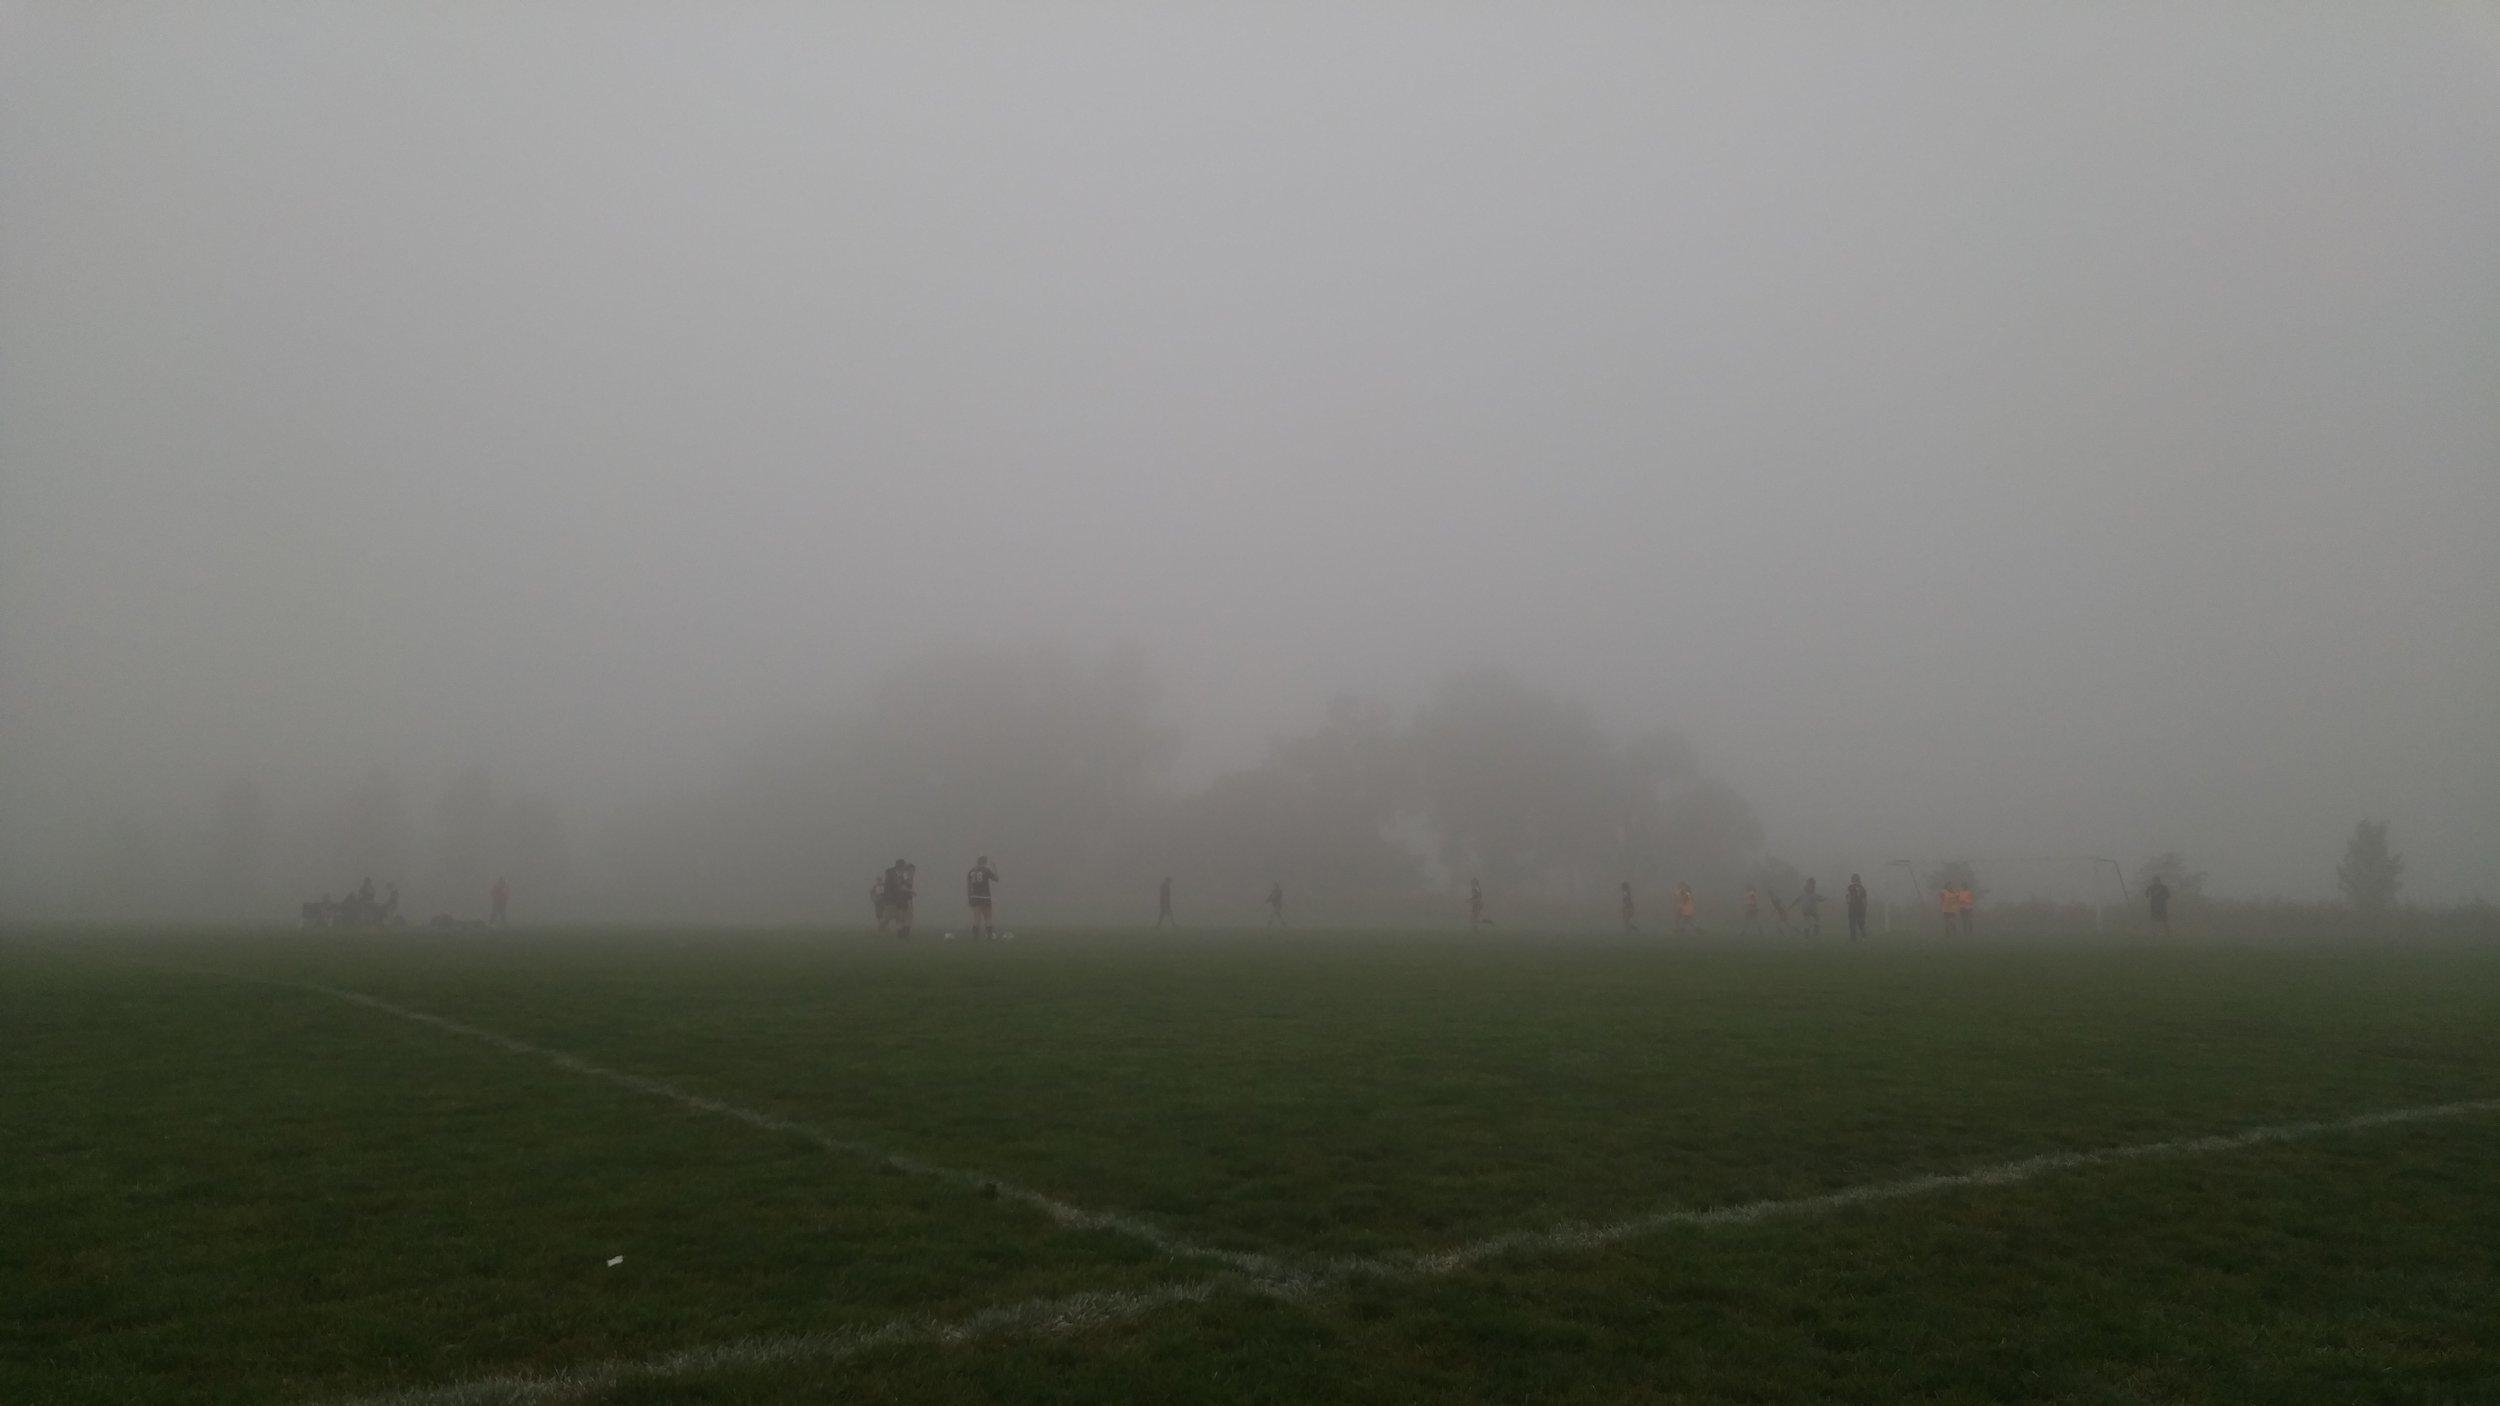 foggy_soccer_field